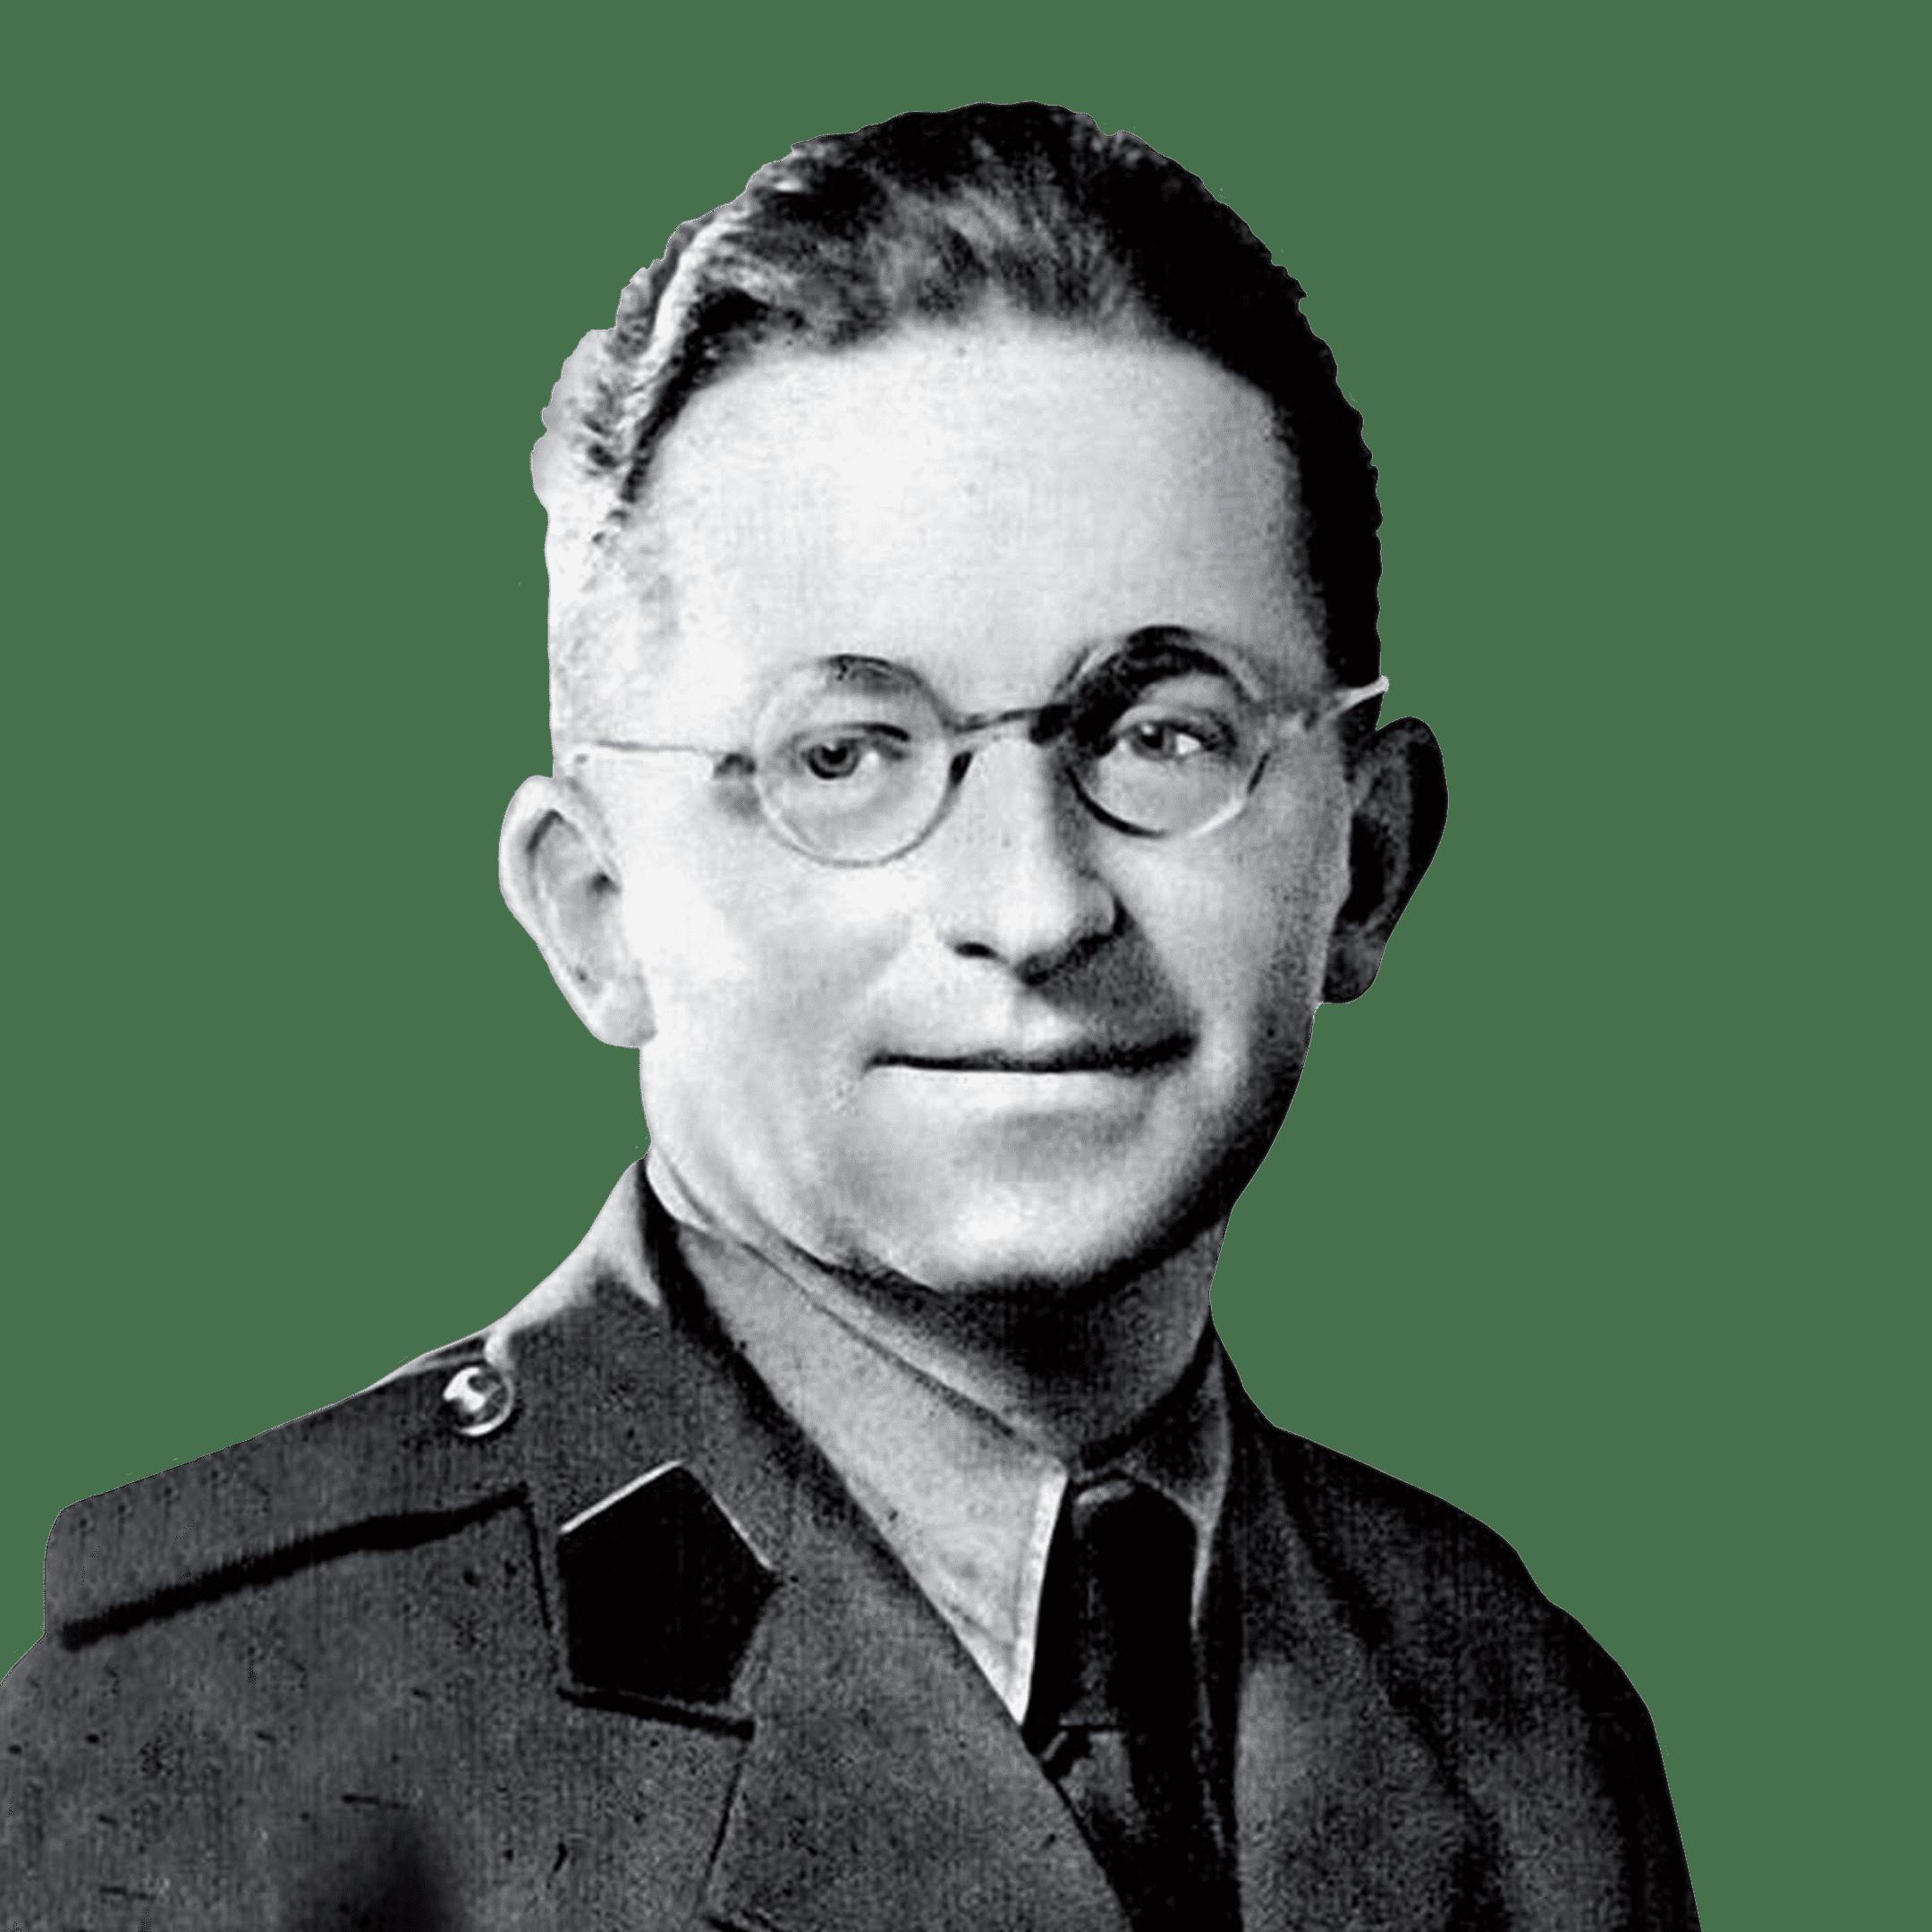 Arthur Scherbius